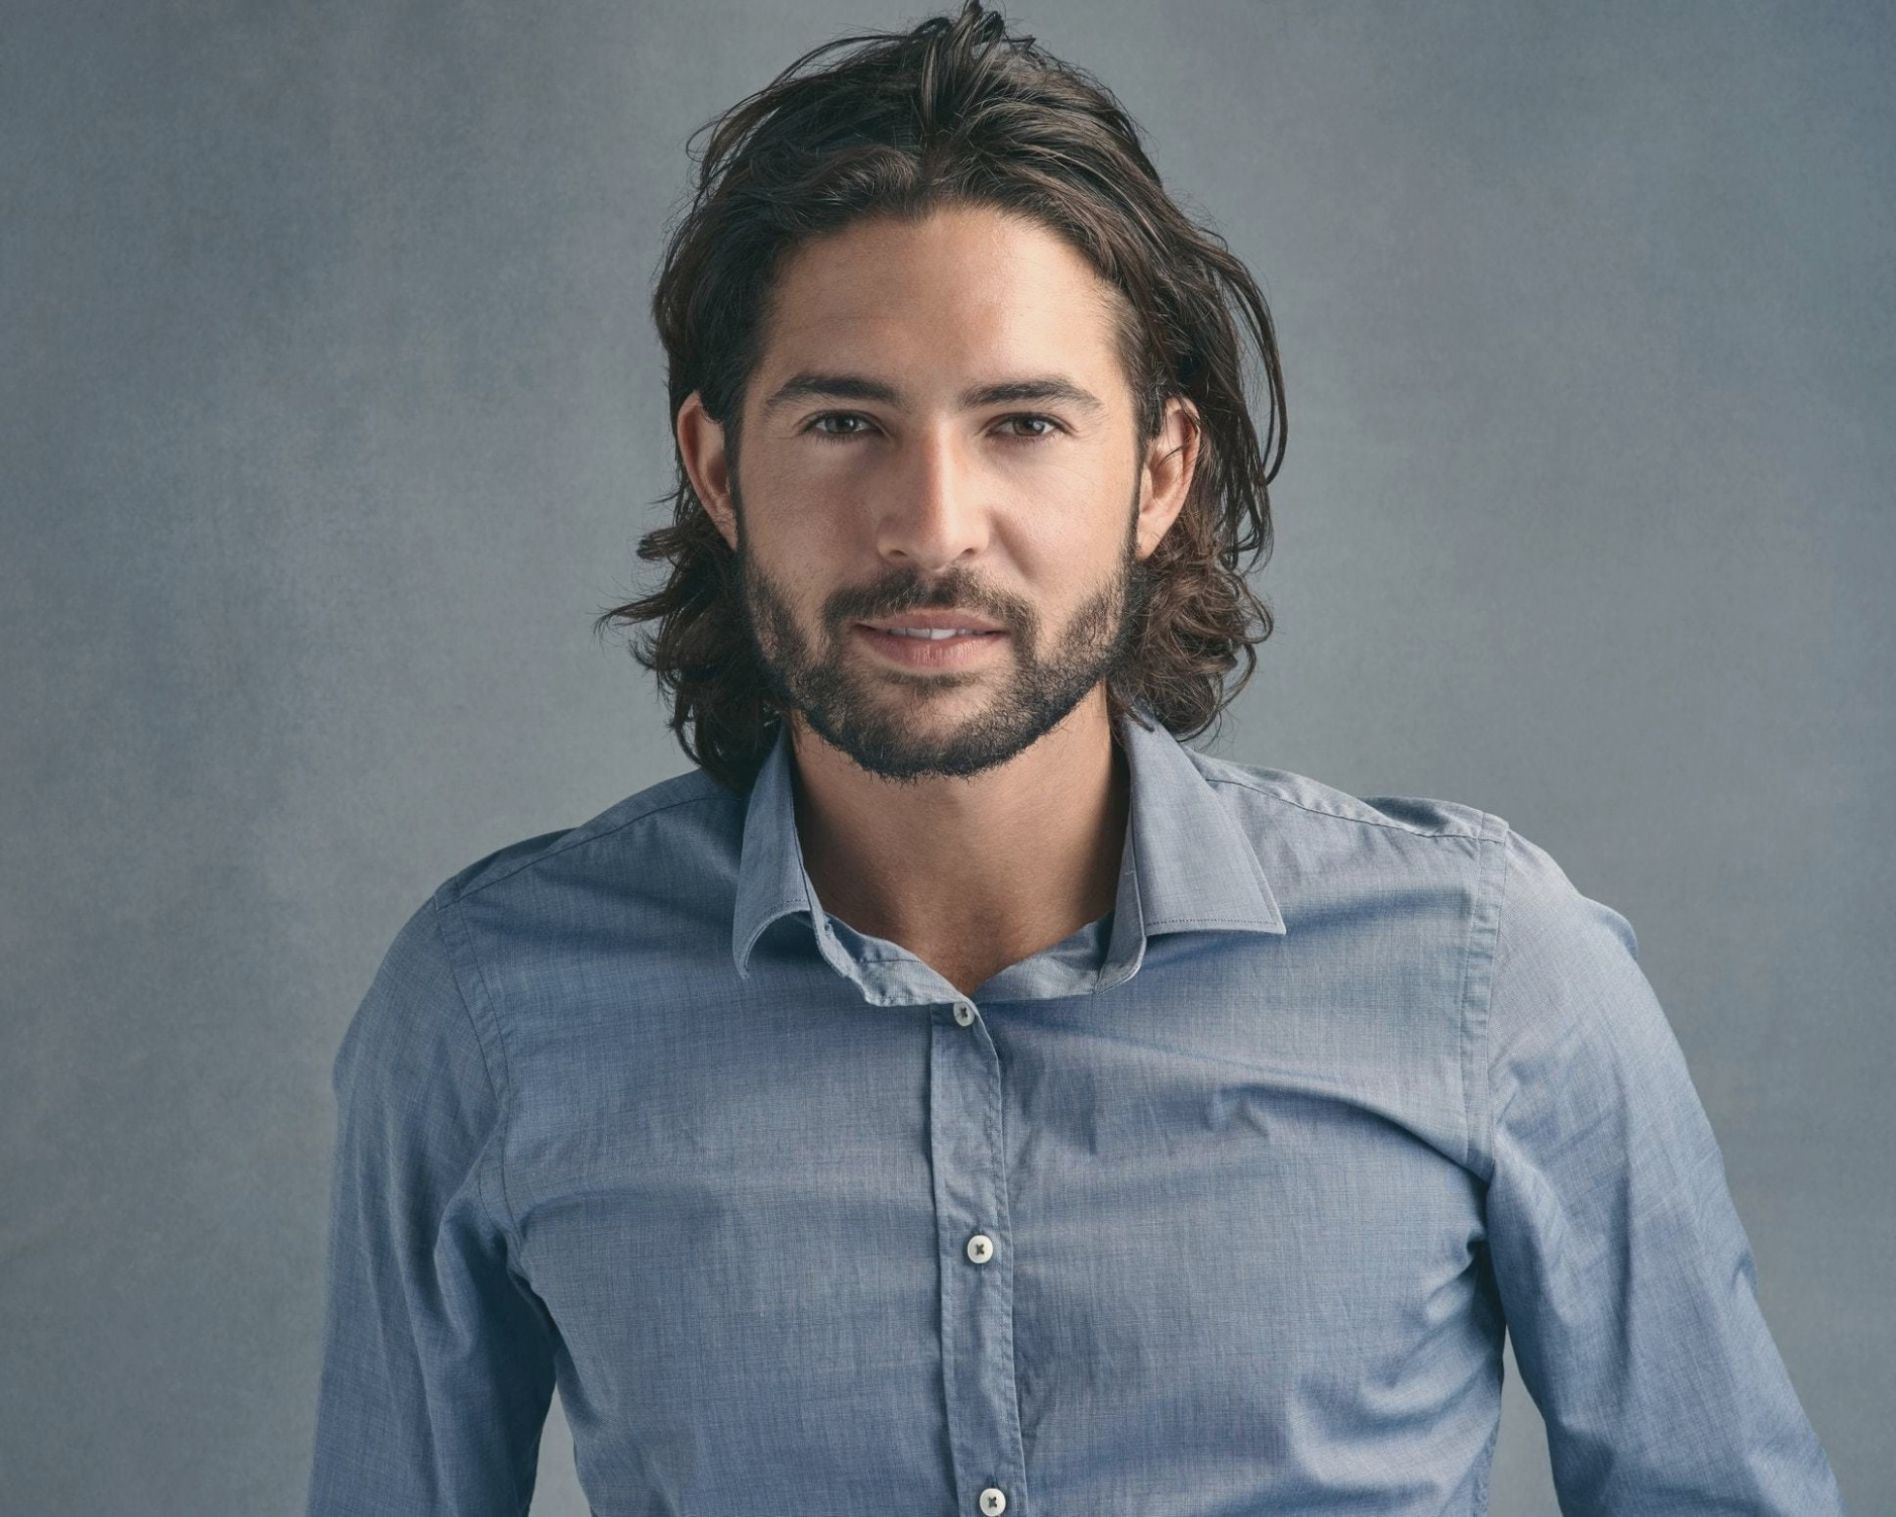 Appealing Pomade For Thick Hair 2019 Earn Modern Men Hairstyle Pomade For Thick Hair Long Hair Styles Men Mens Hairstyles Thick Hair Mens Hairstyles Medium